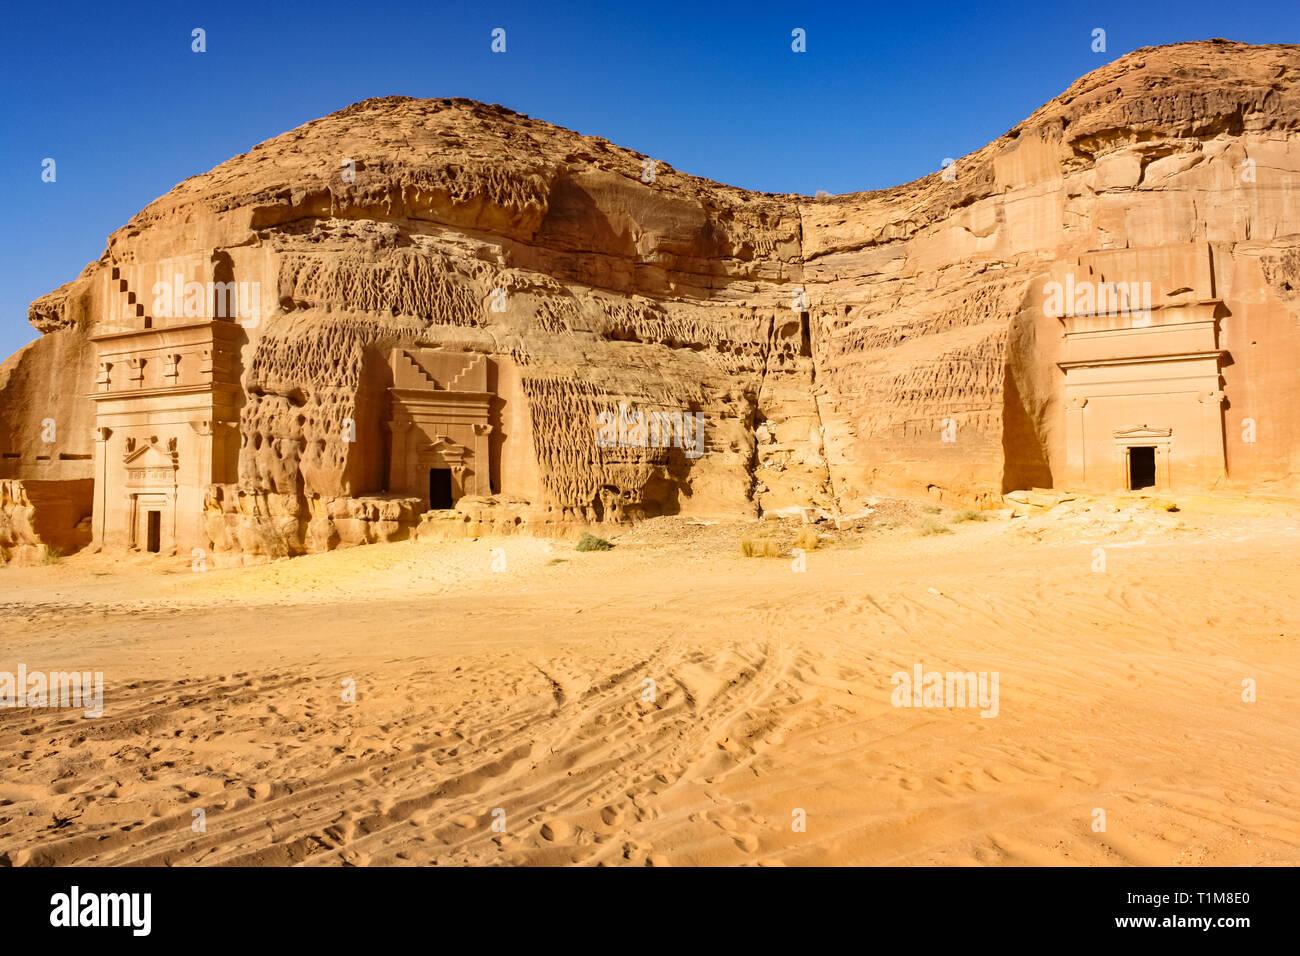 Rock-cut Nabatean tombs of Mada'in Sale, a UNESCO world heritage site in Saudi Arabia. Stock Photo